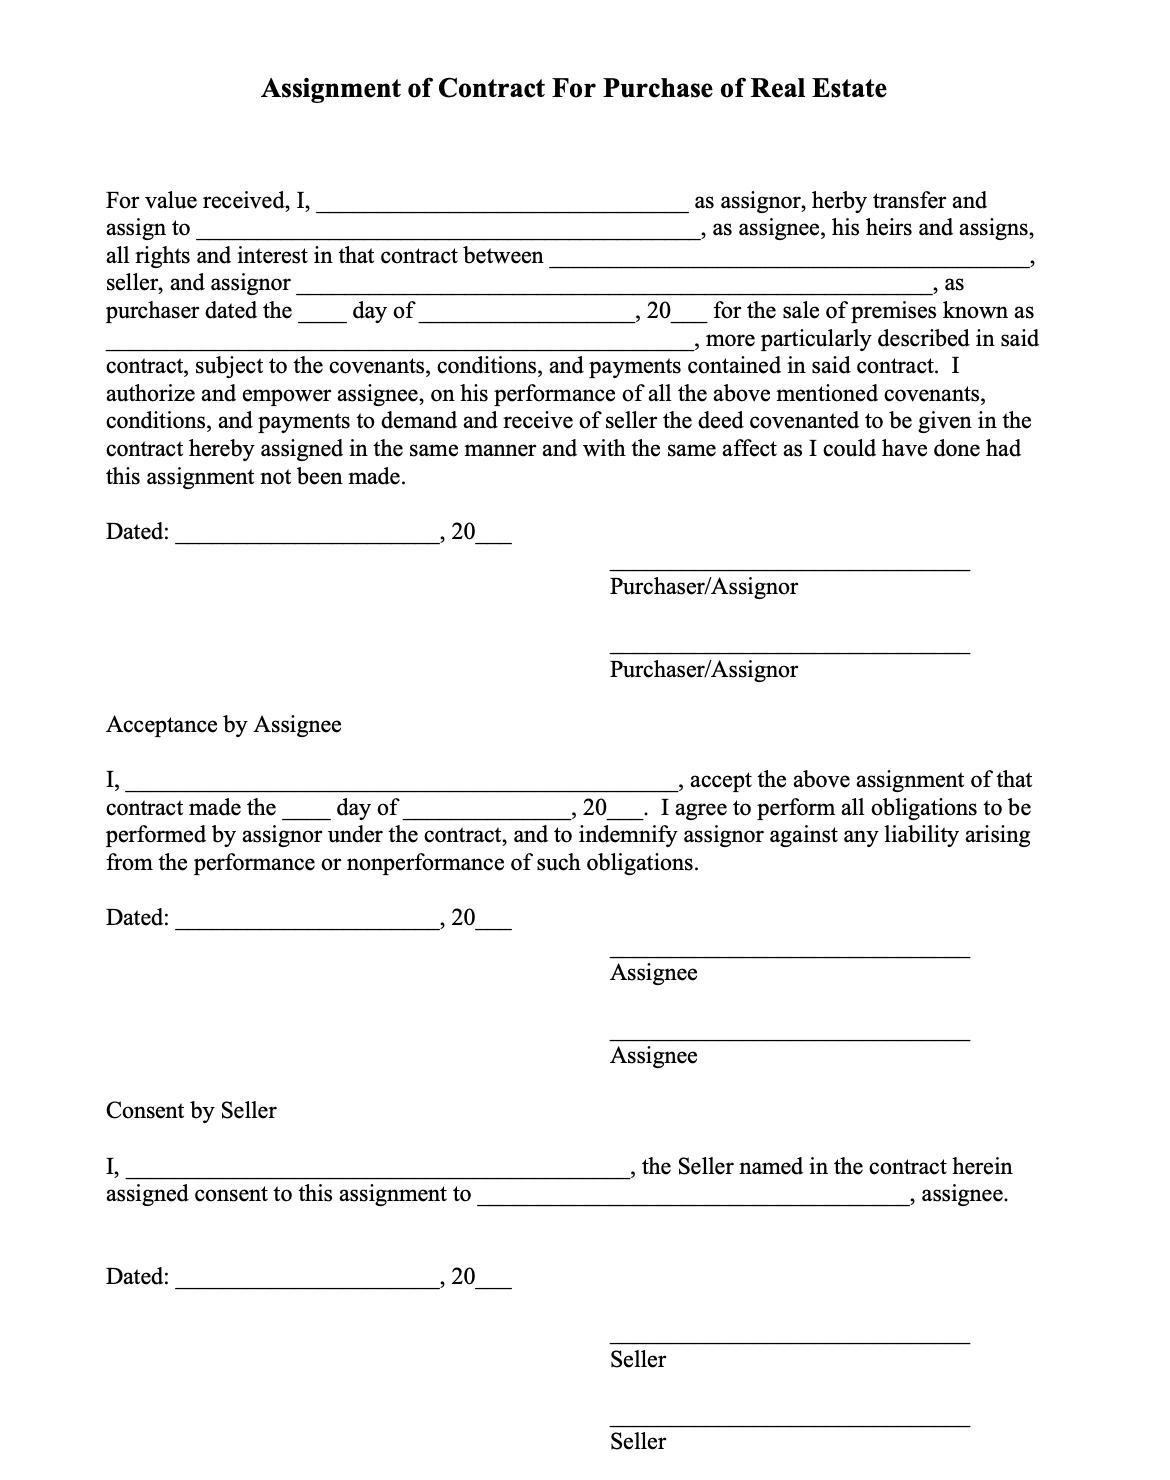 Massachusetts purchase contract